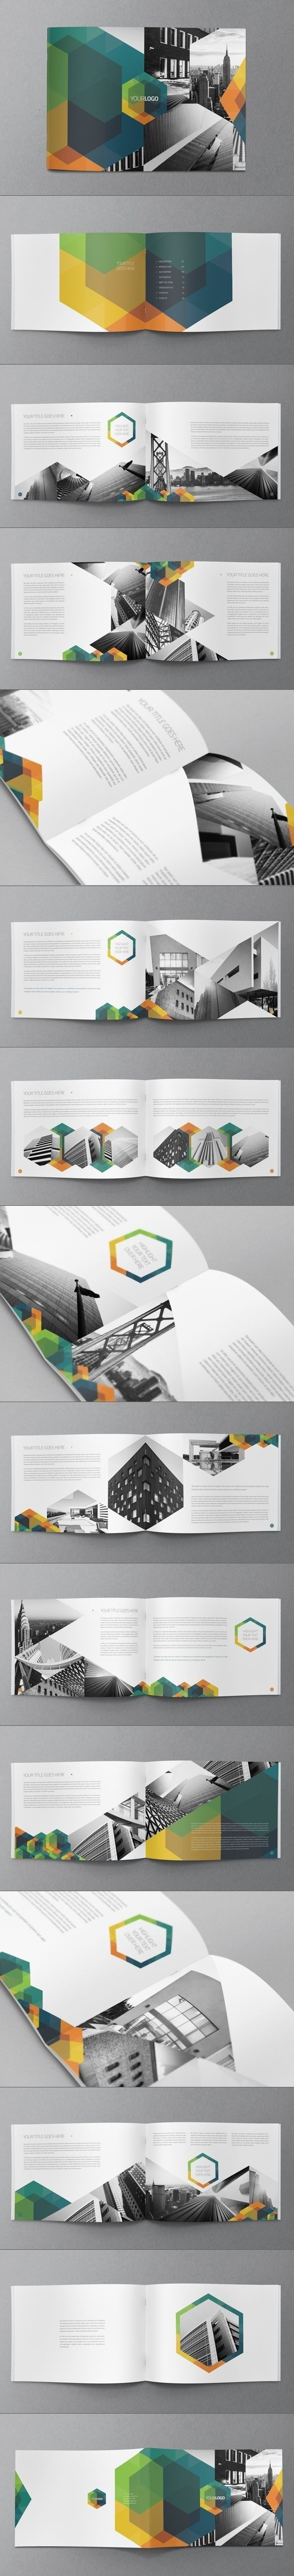 Hexo Brochure Design by Abra Design | Graphic Design in Geometry